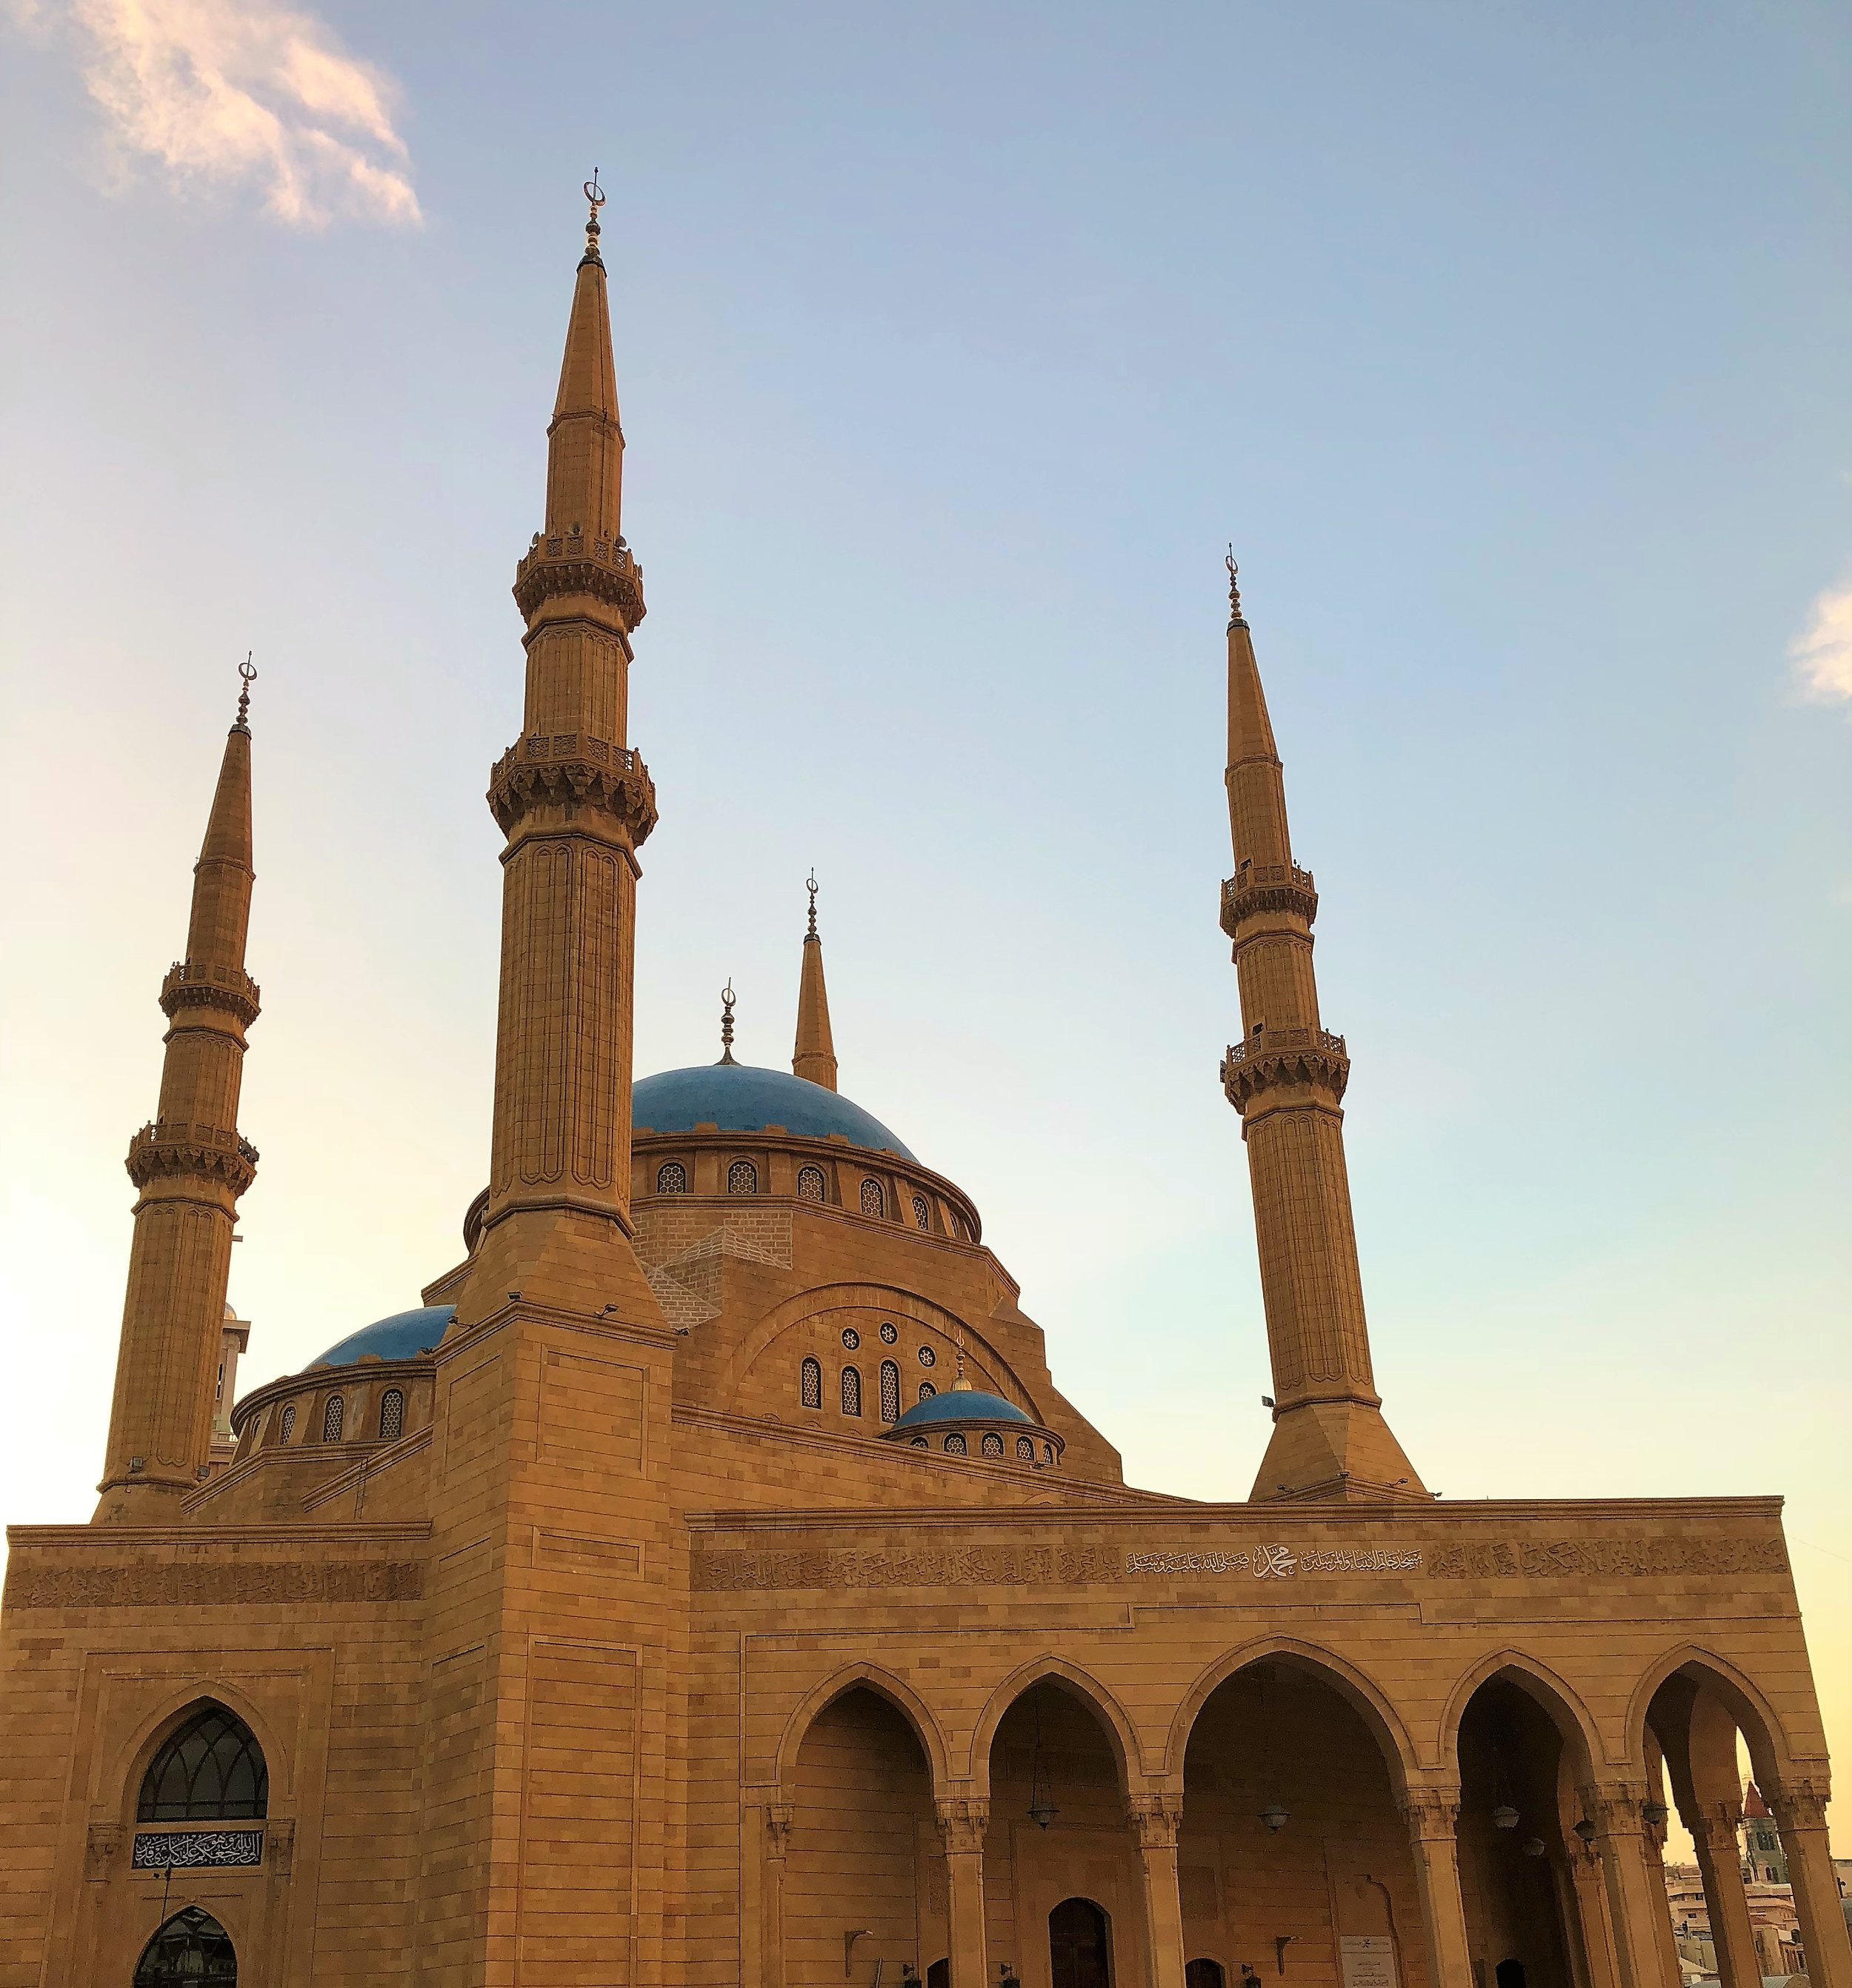 Mohamad al-Amin Mosque